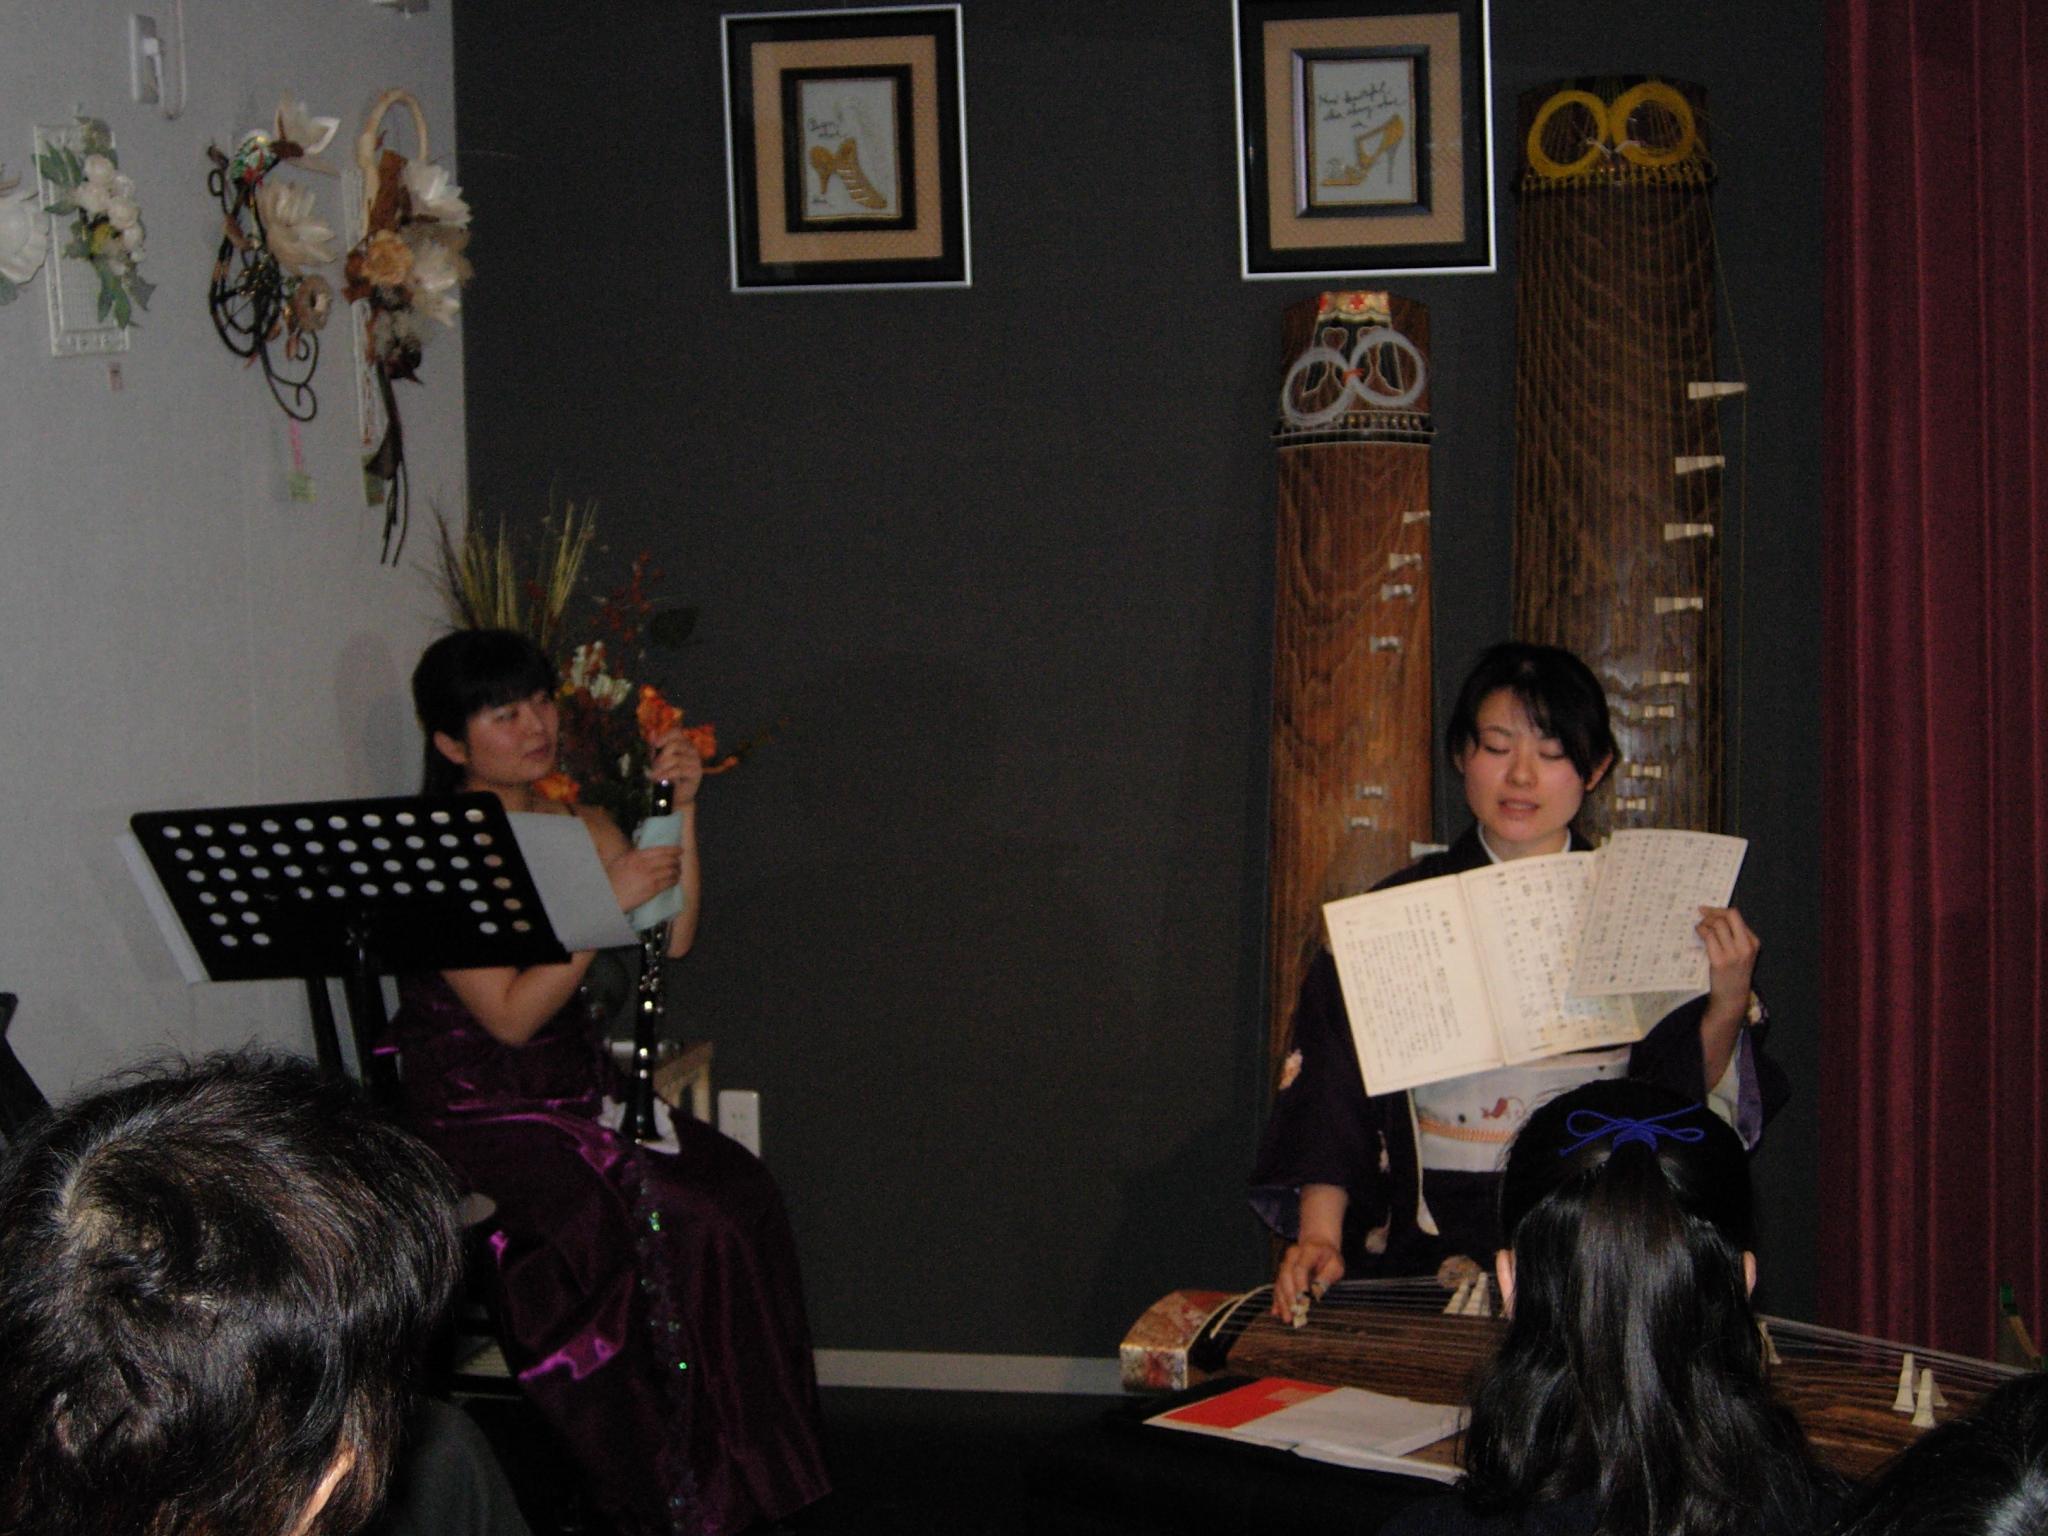 http://chanter-yachiyo.com/2011_0110_120148-DSCN1388.JPG